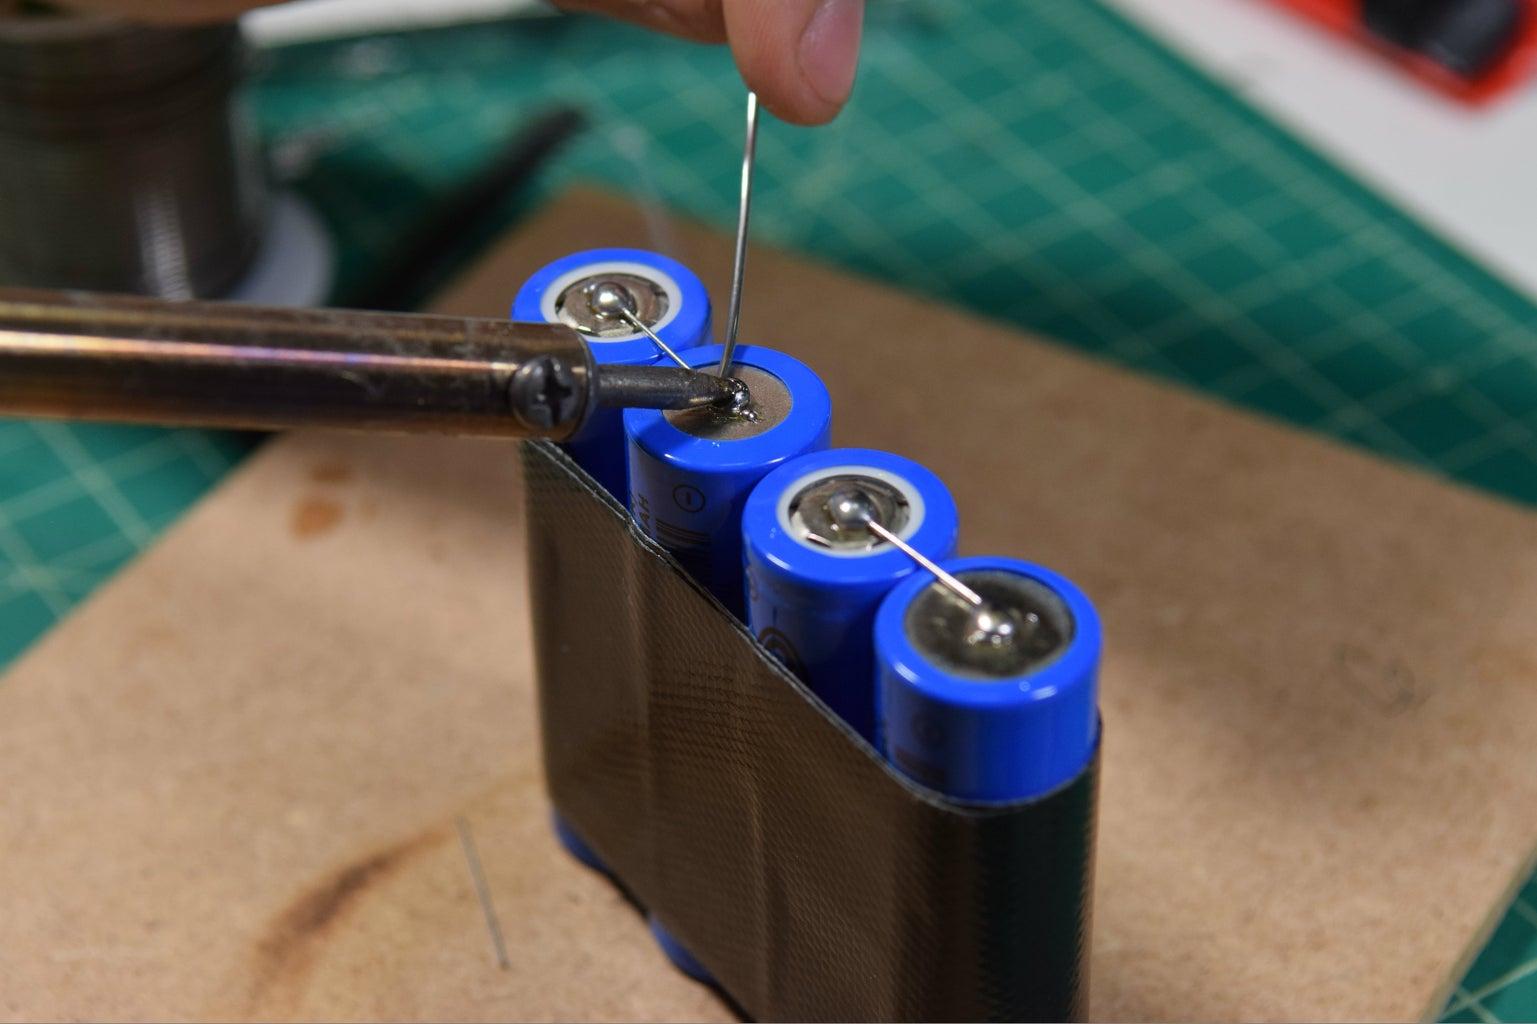 Assemble Li-ion the Battery Pack